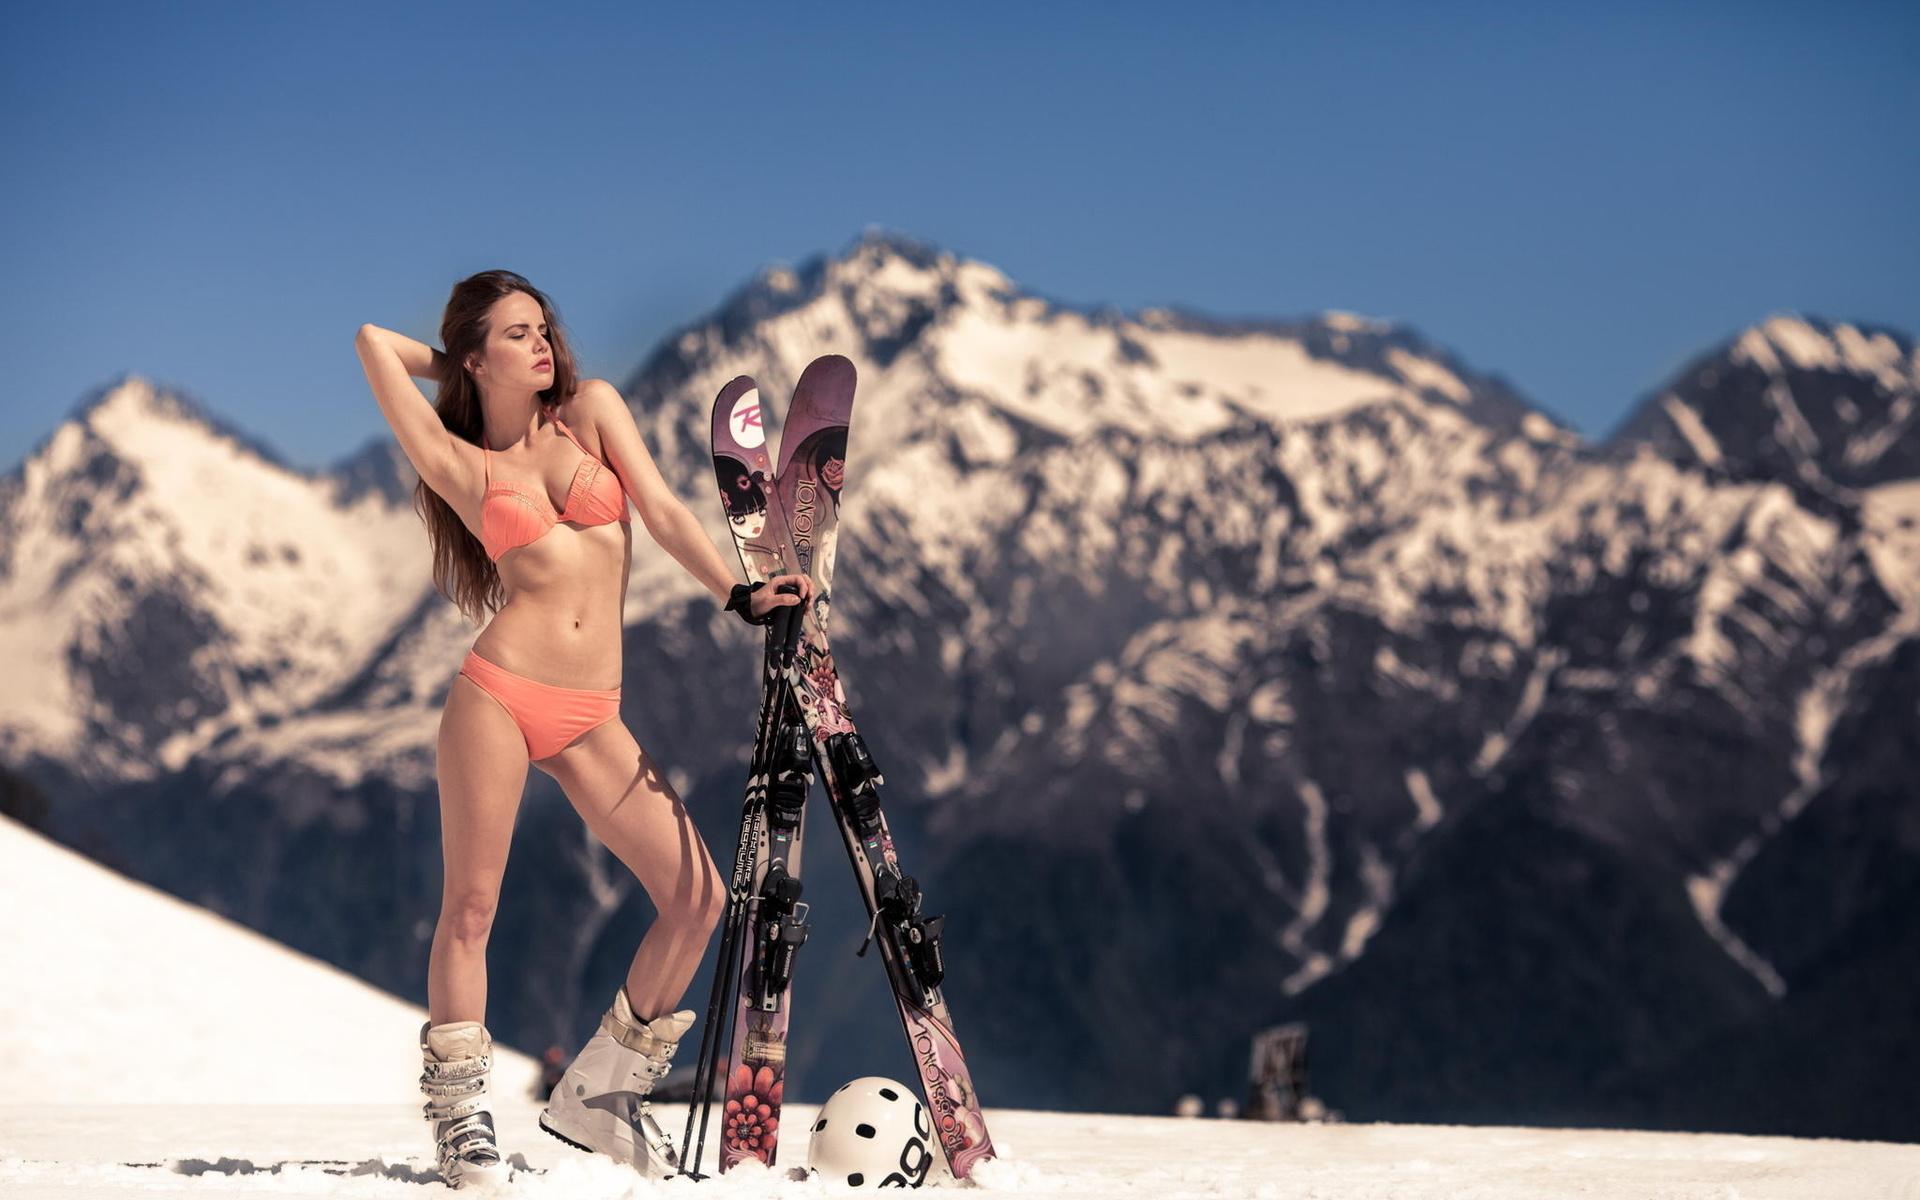 Эротика фото в горах сочи 18 фотография